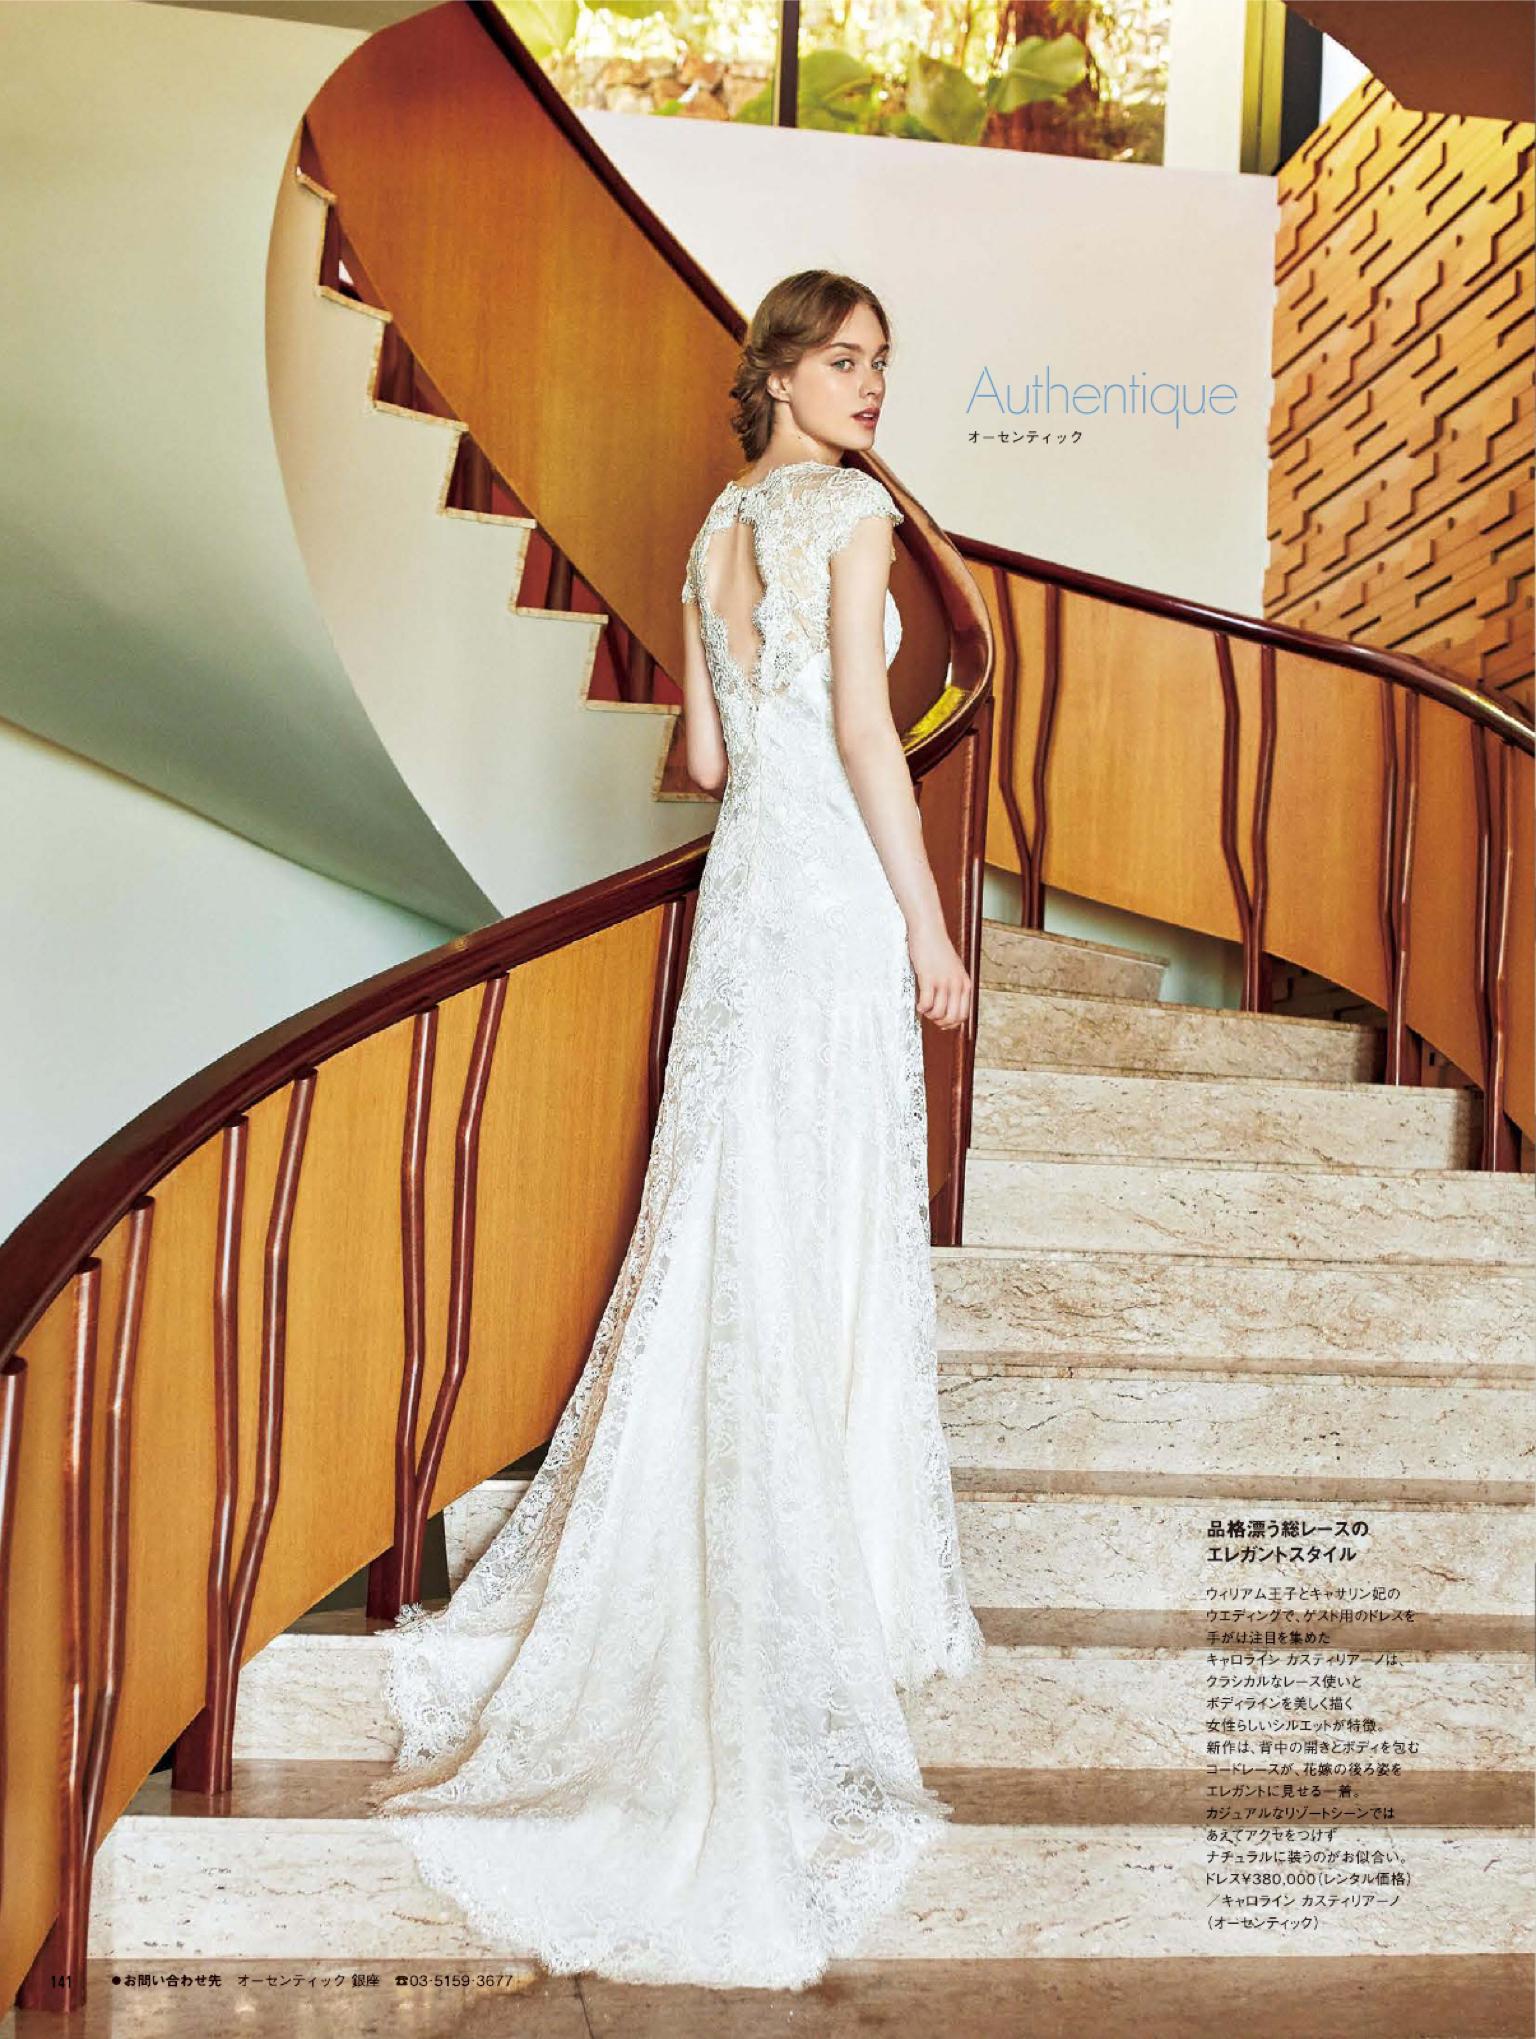 Elle Mariage Japan Celeste designer wedding gown by Caroline Castigliano